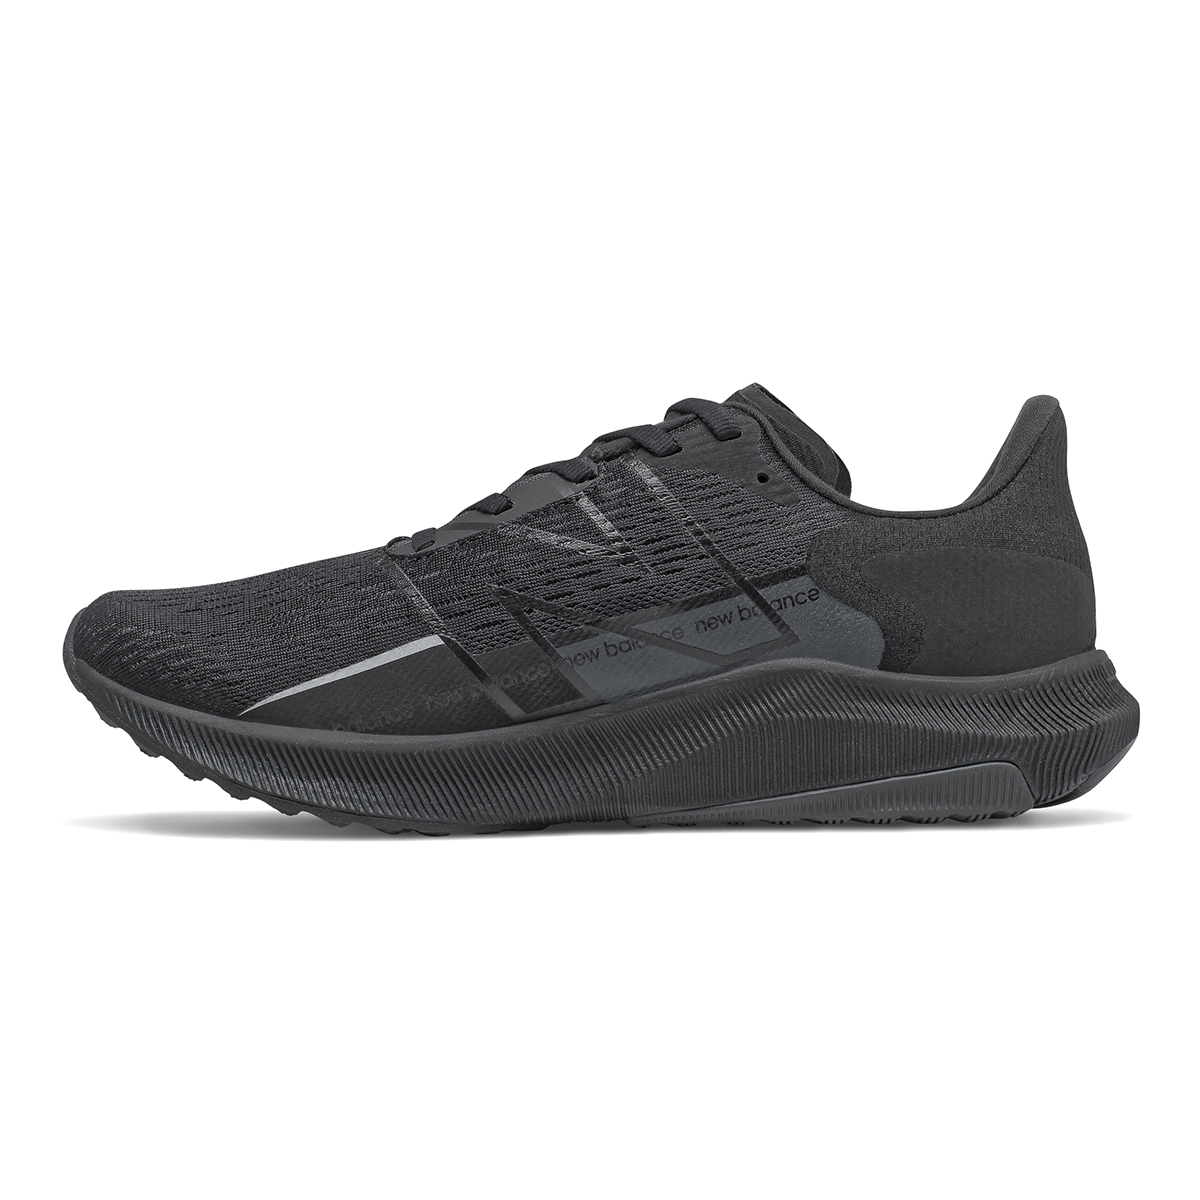 Men's New Balance Fuelcell Propel V2 Running Shoe - Color: Black - Size: 7 - Width: Wide, Black, large, image 2